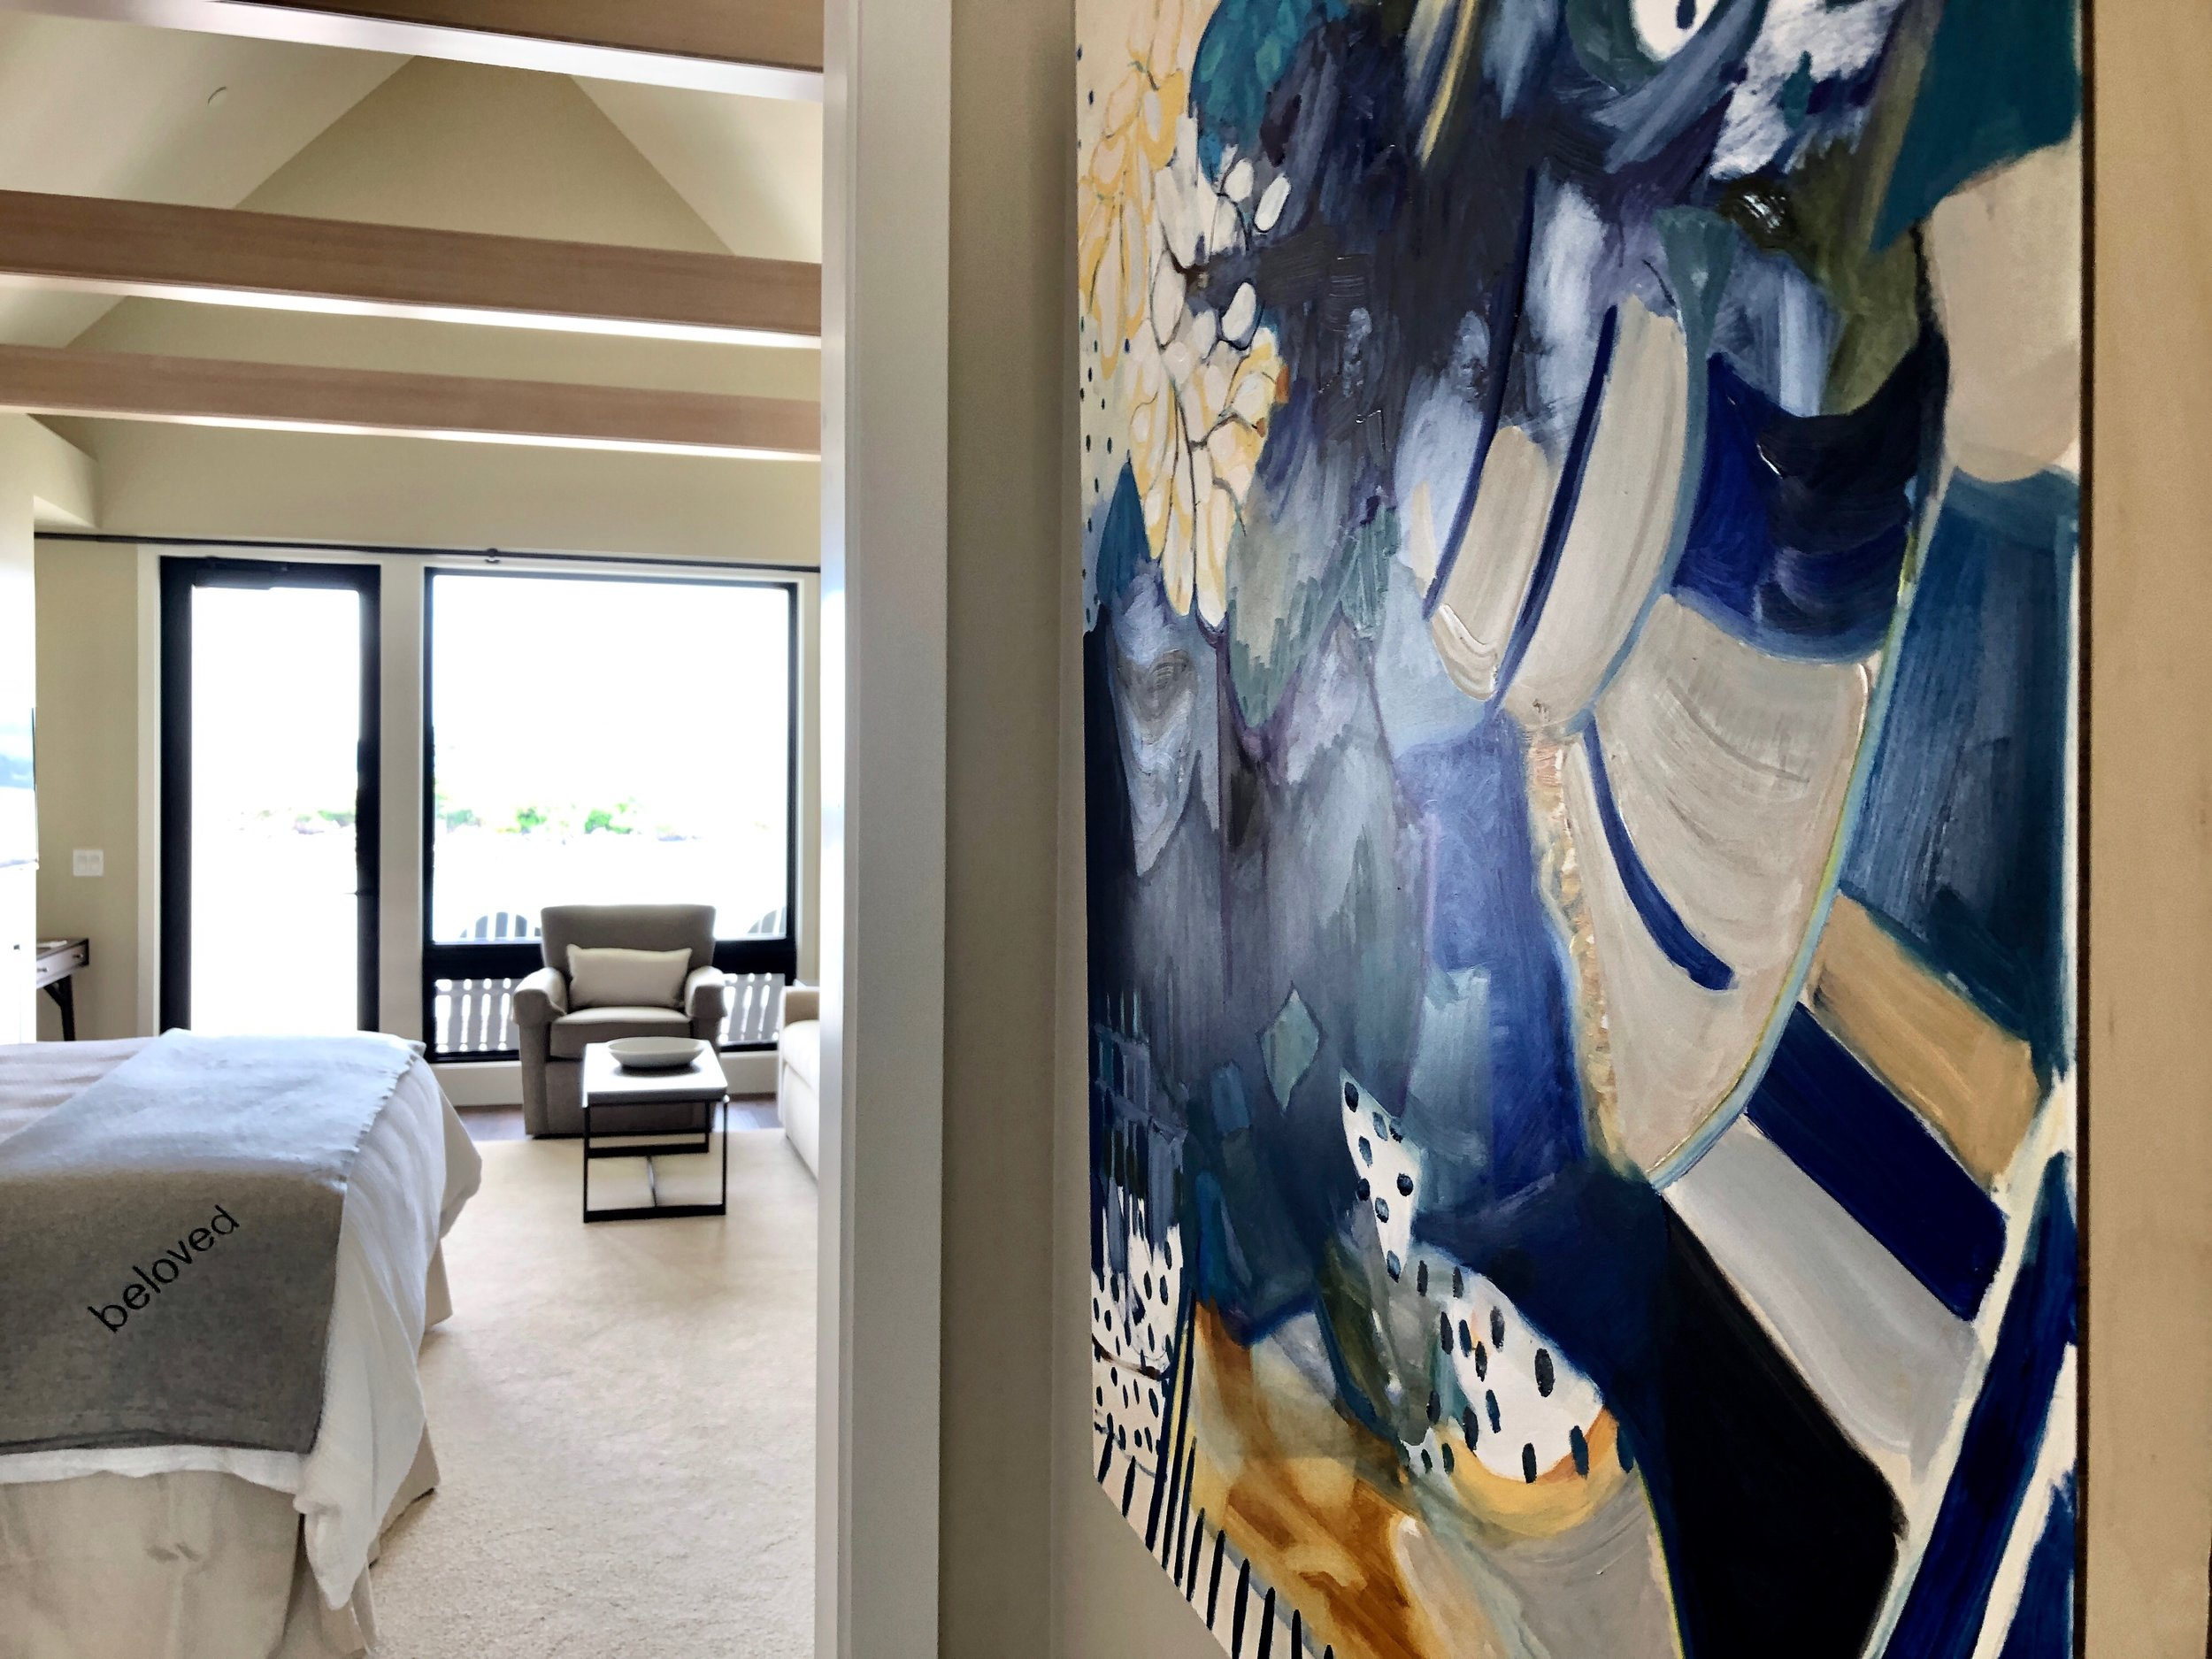 Original Oil Paintings in All Rooms